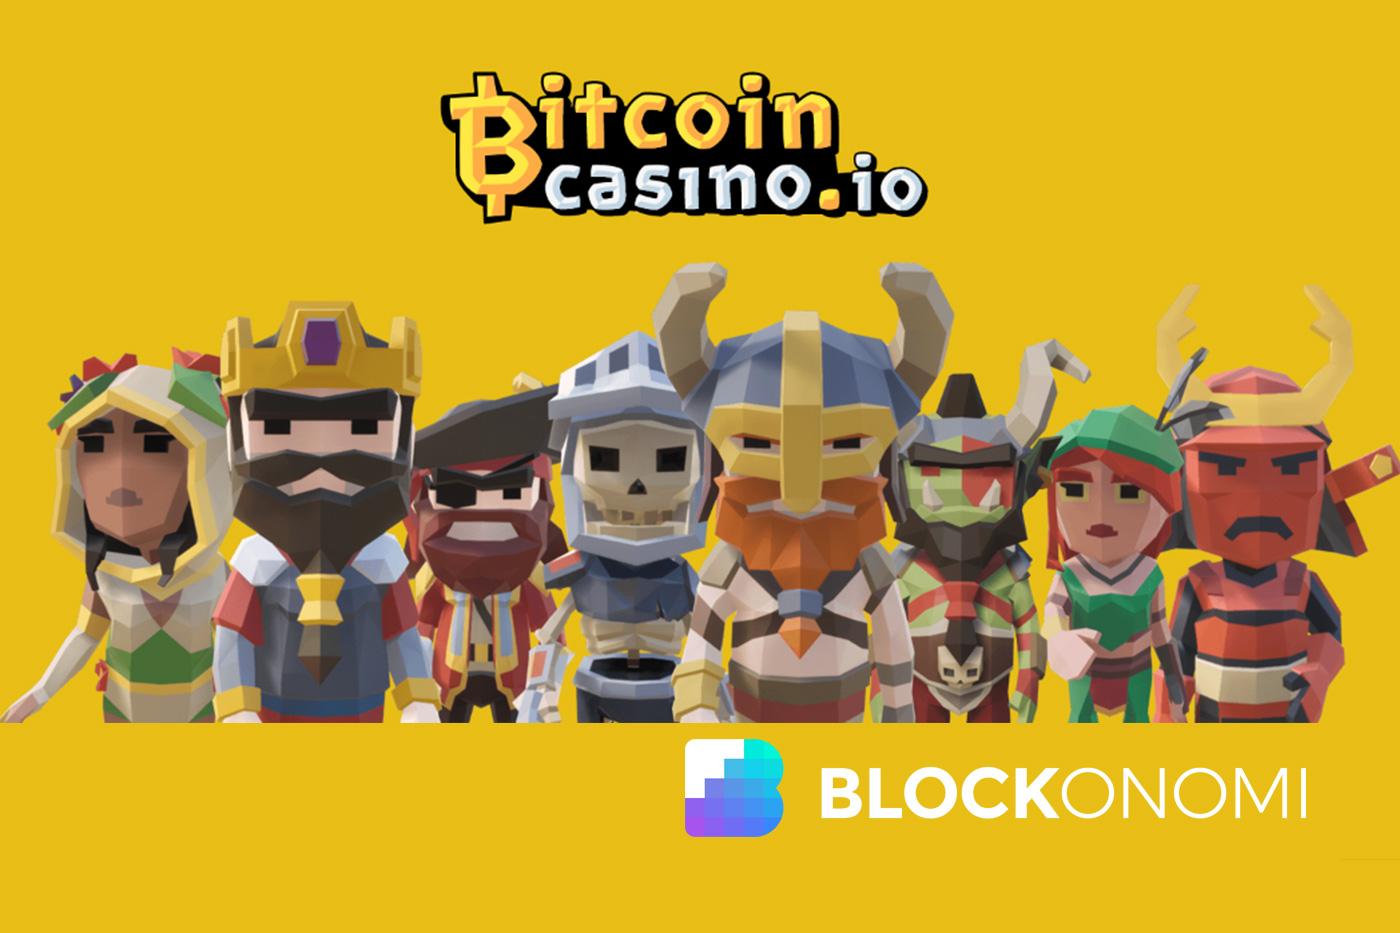 Bitcoin penguin no deposit bonus